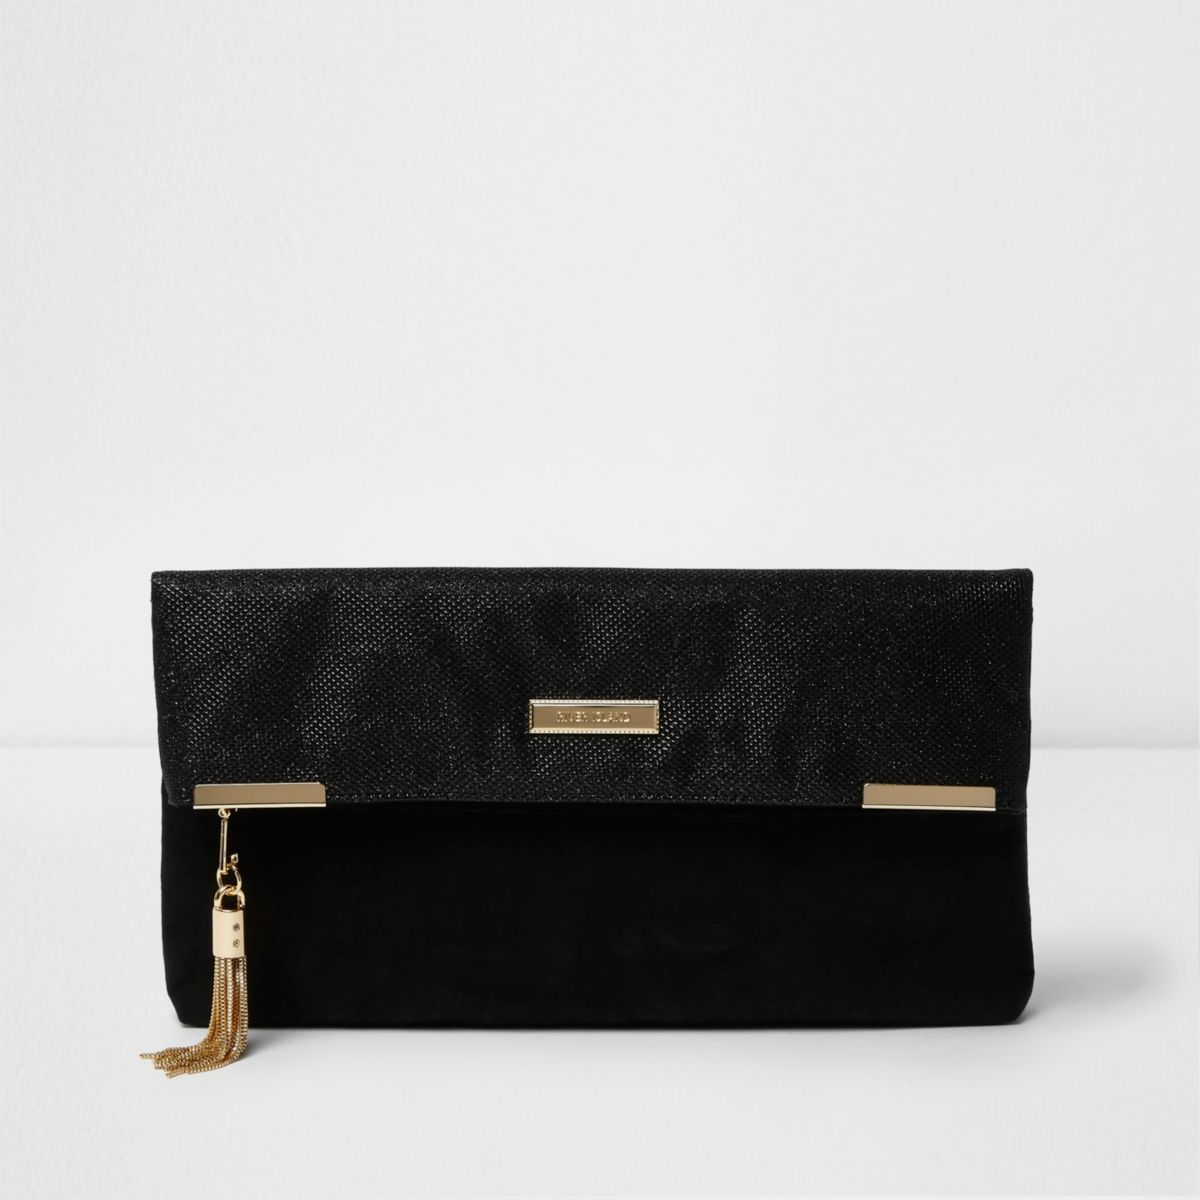 Black tassel detail foldover clutch bag